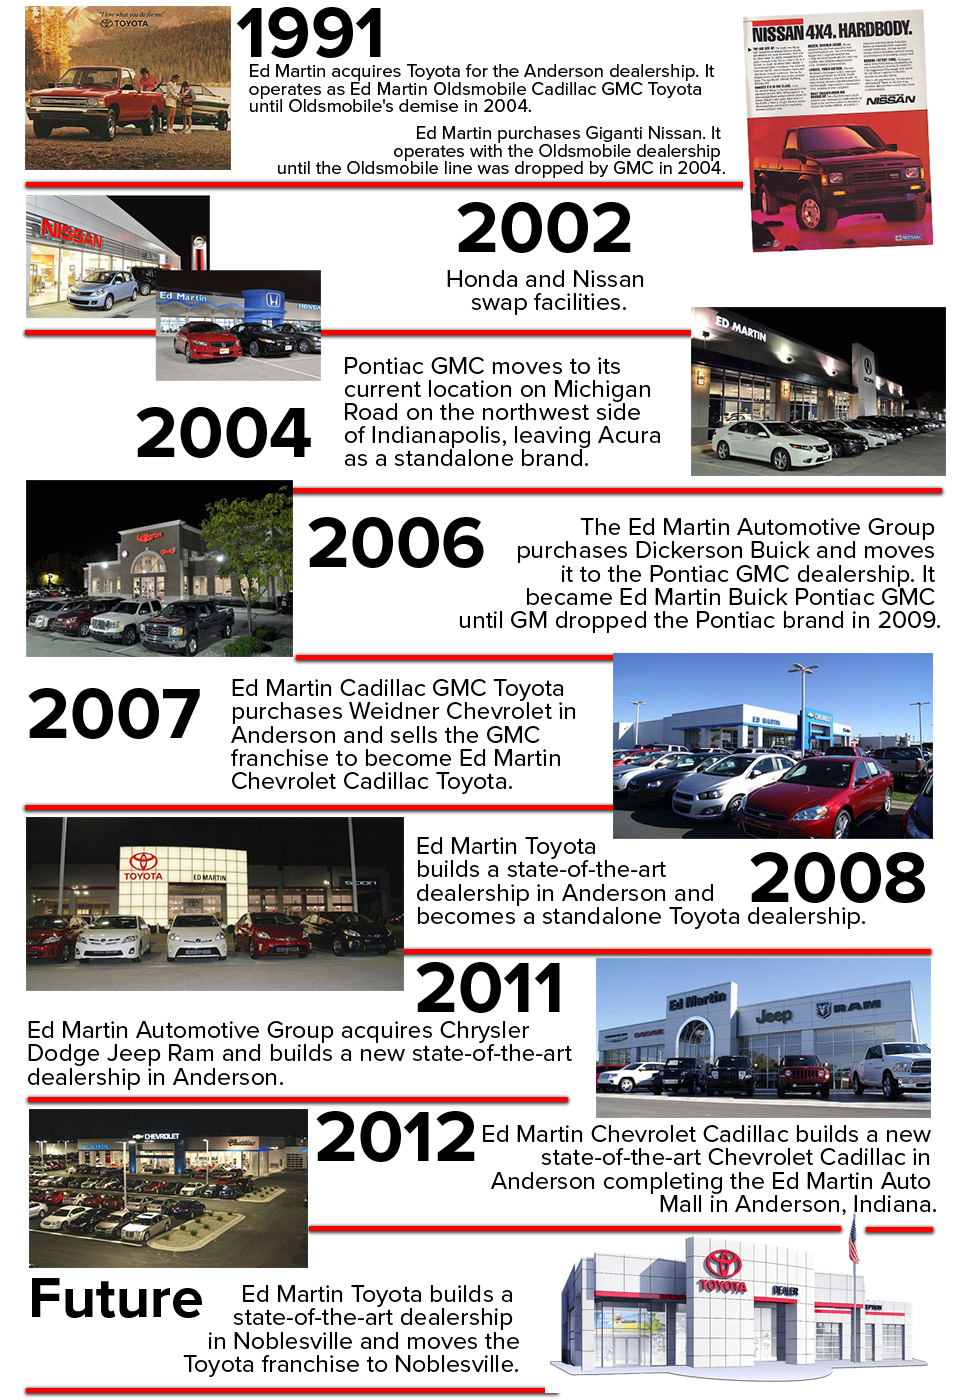 Ed Martin Chrysler Dodge Jeep RAM | New Chrysler, Dodge, Jeep, Ram